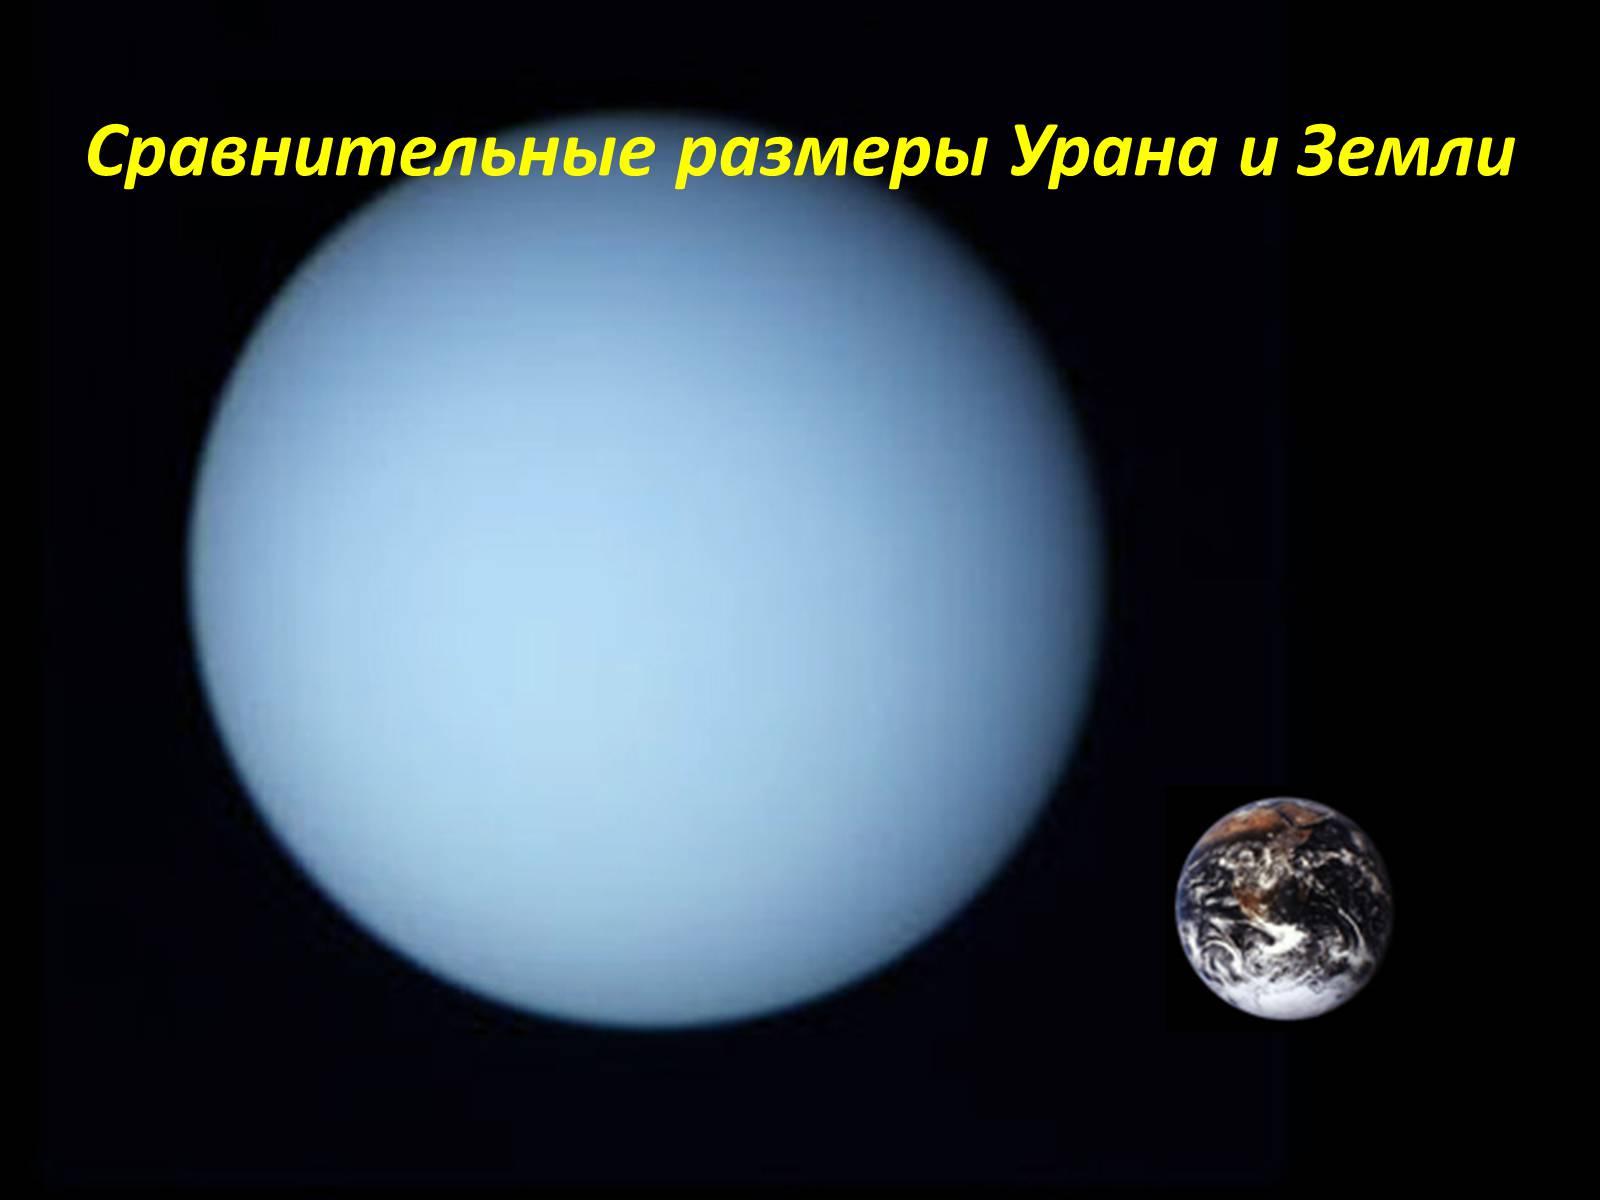 Картинка сравнения земли и урана